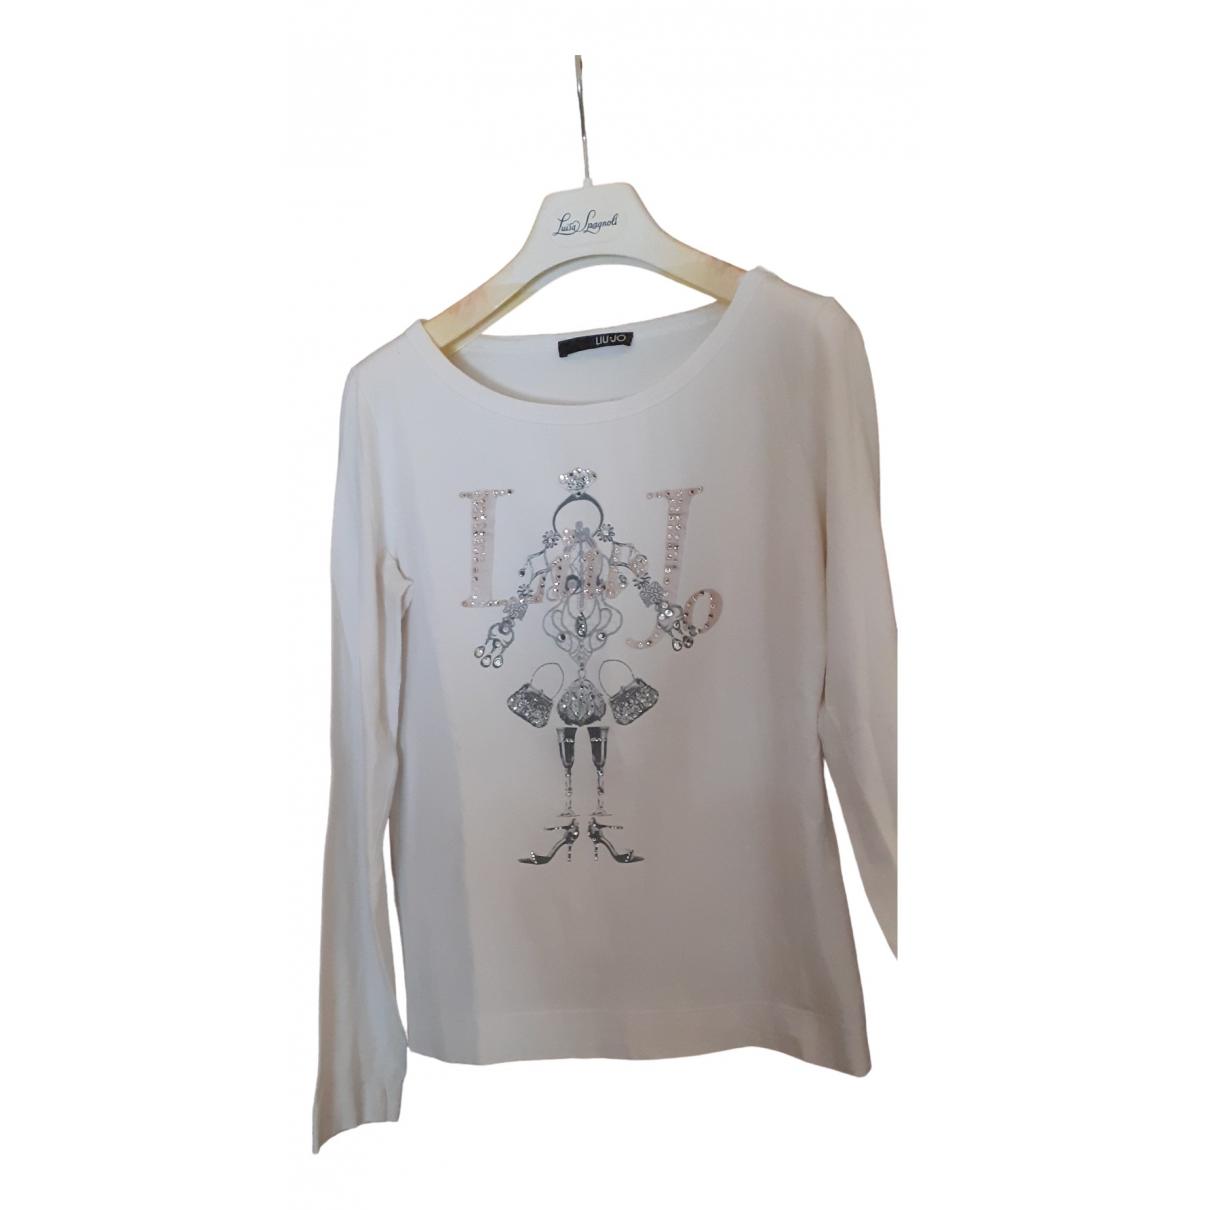 Liu.jo - Pull   pour femme en coton - blanc